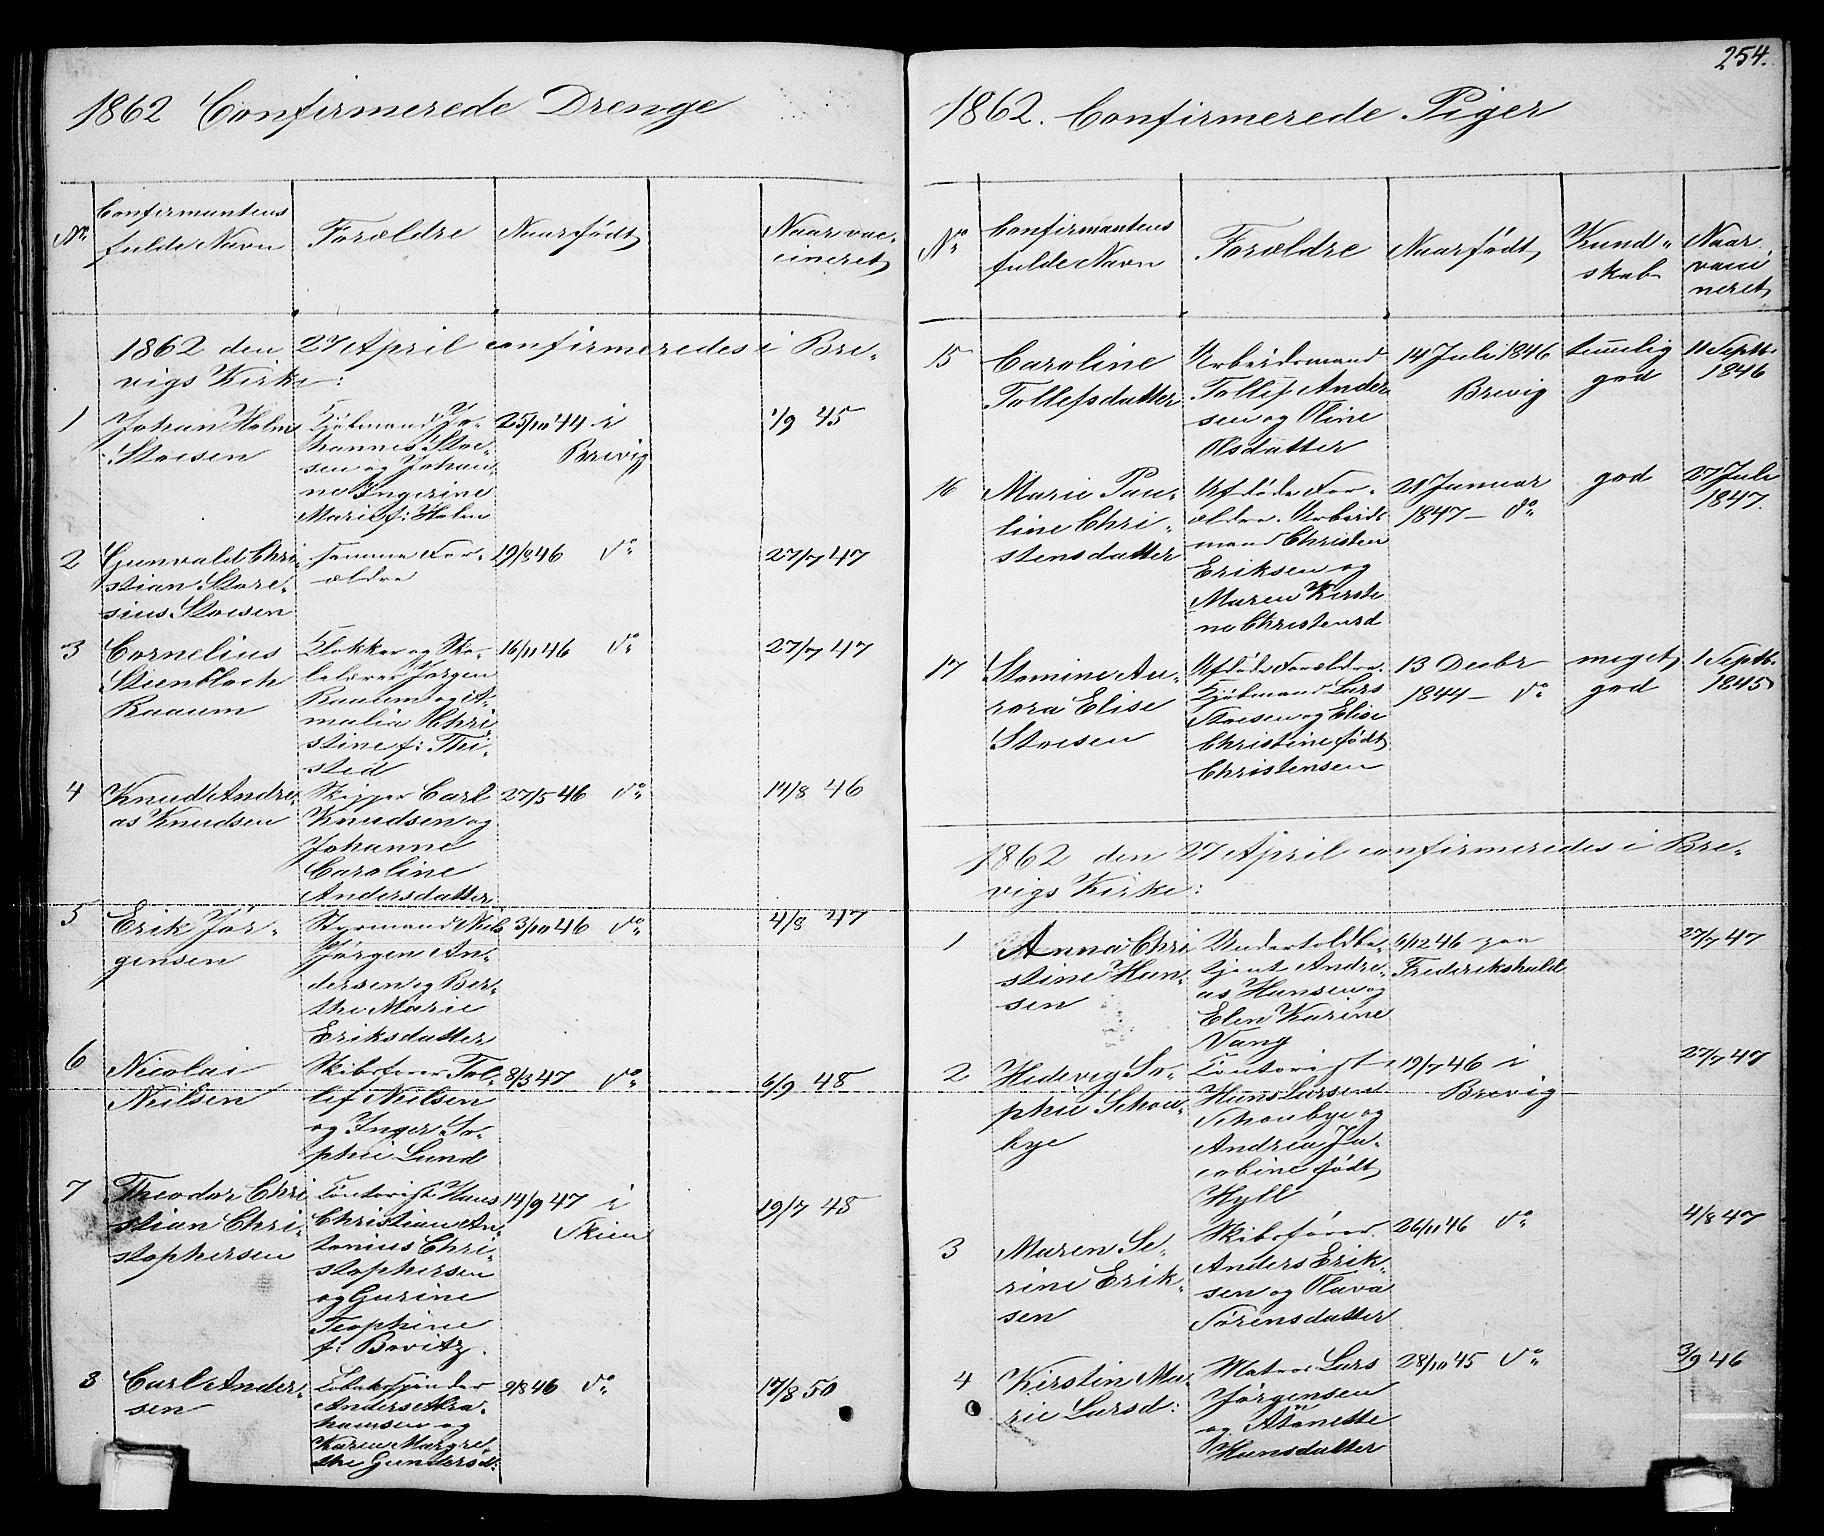 SAKO, Brevik kirkebøker, G/Ga/L0002: Klokkerbok nr. 2, 1846-1865, s. 254